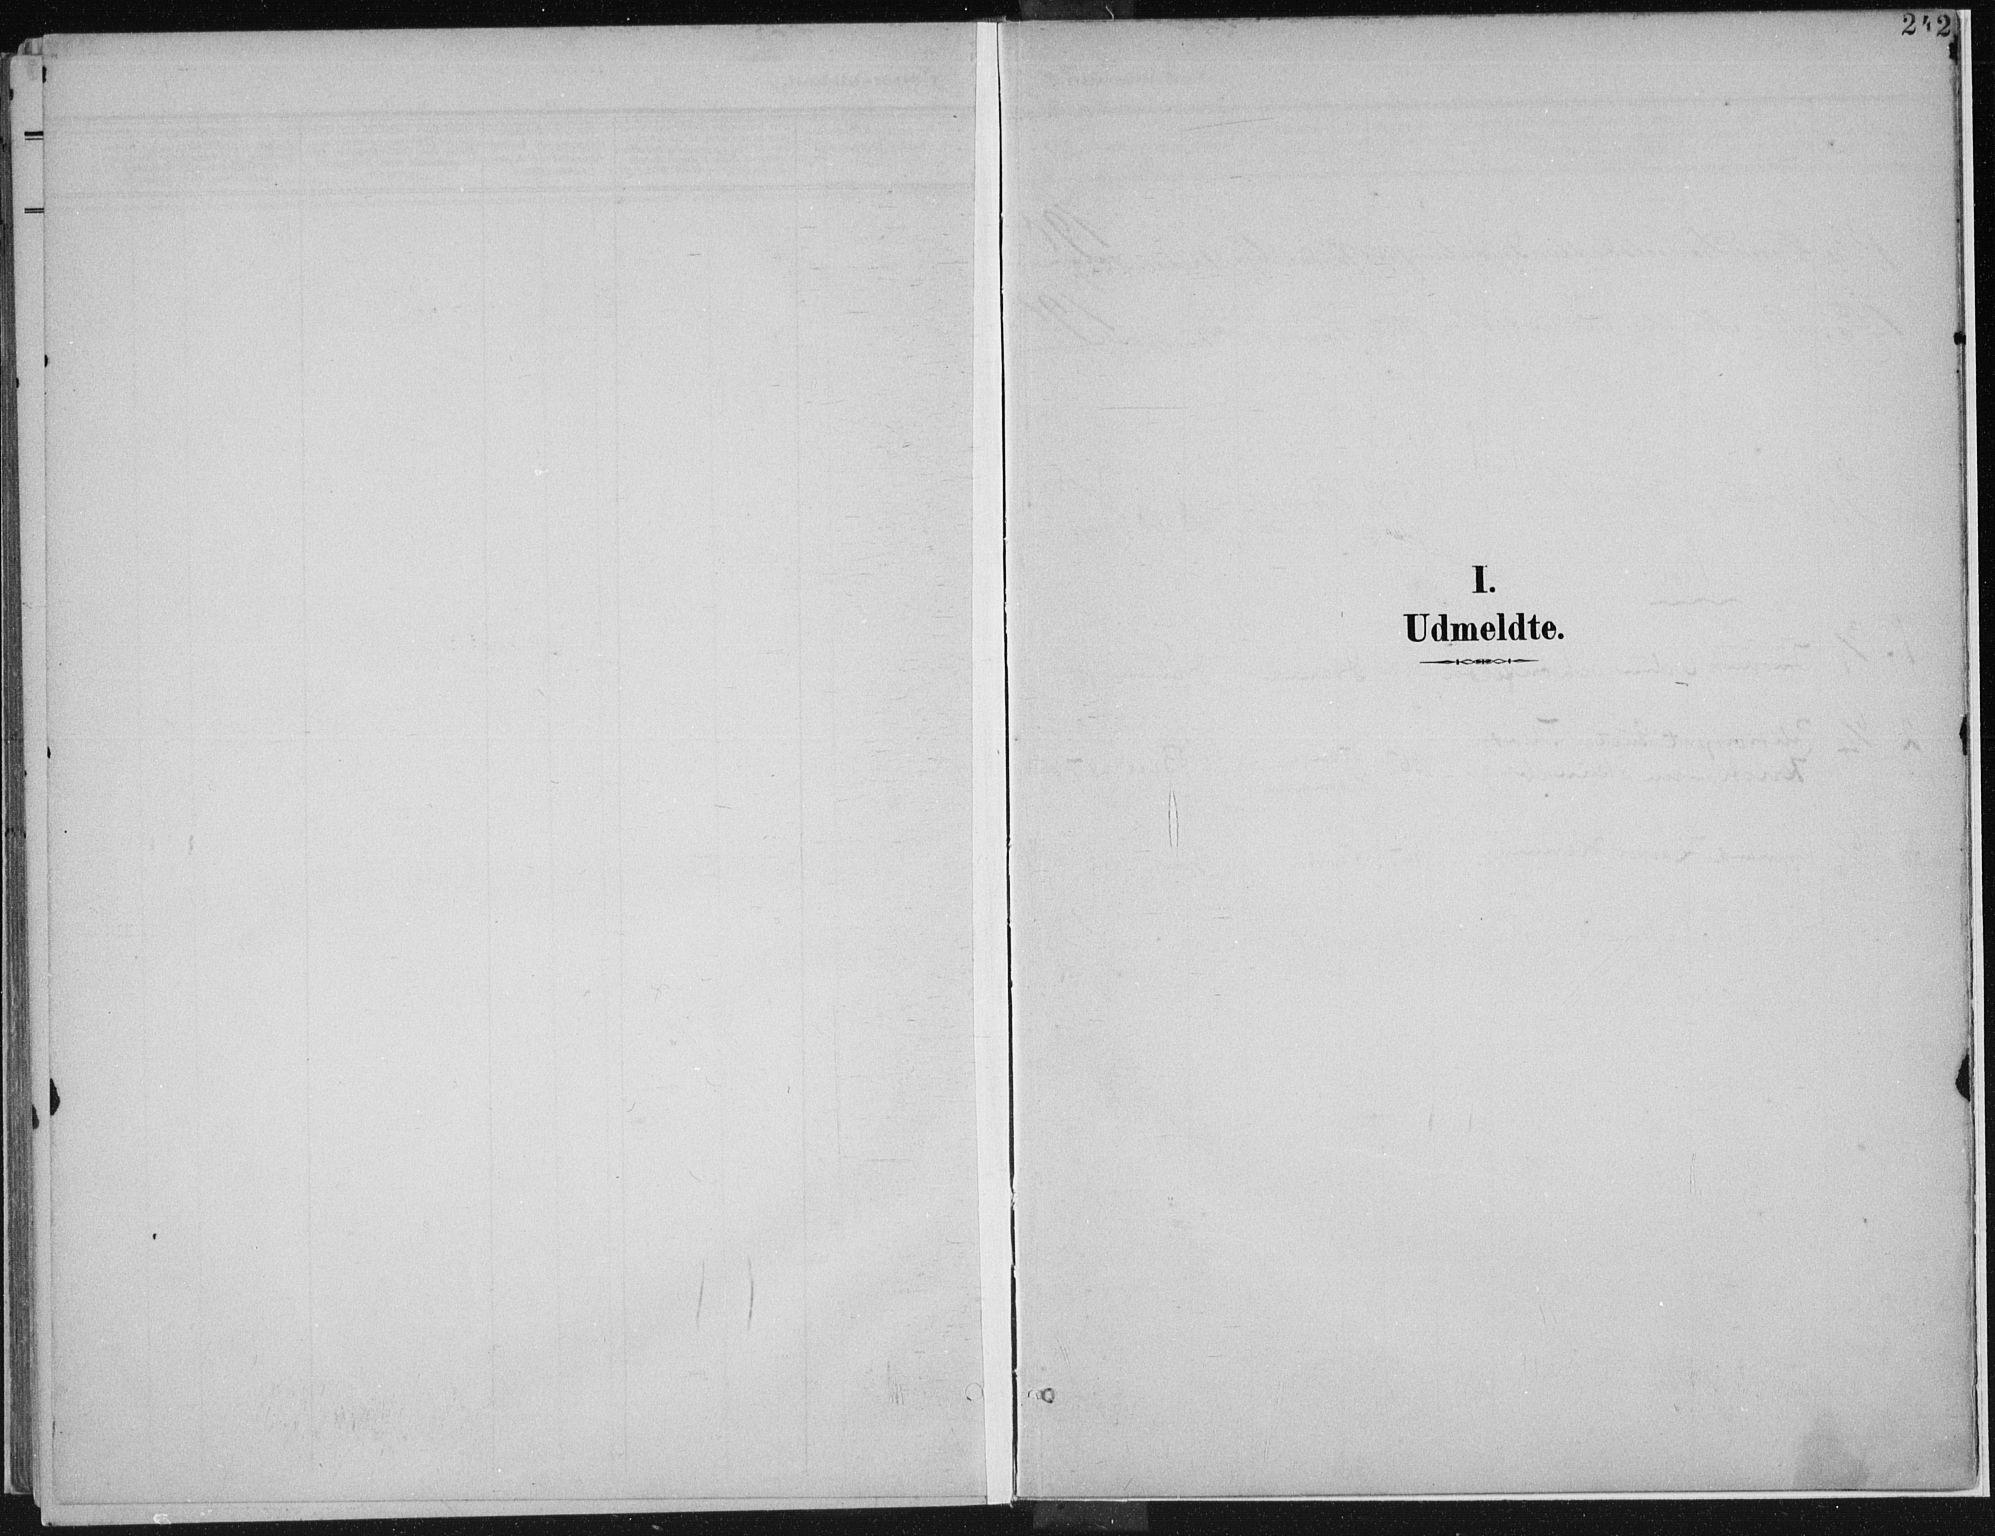 SAH, Vardal prestekontor, H/Ha/Haa/L0013: Ministerialbok nr. 13, 1901-1911, s. 242